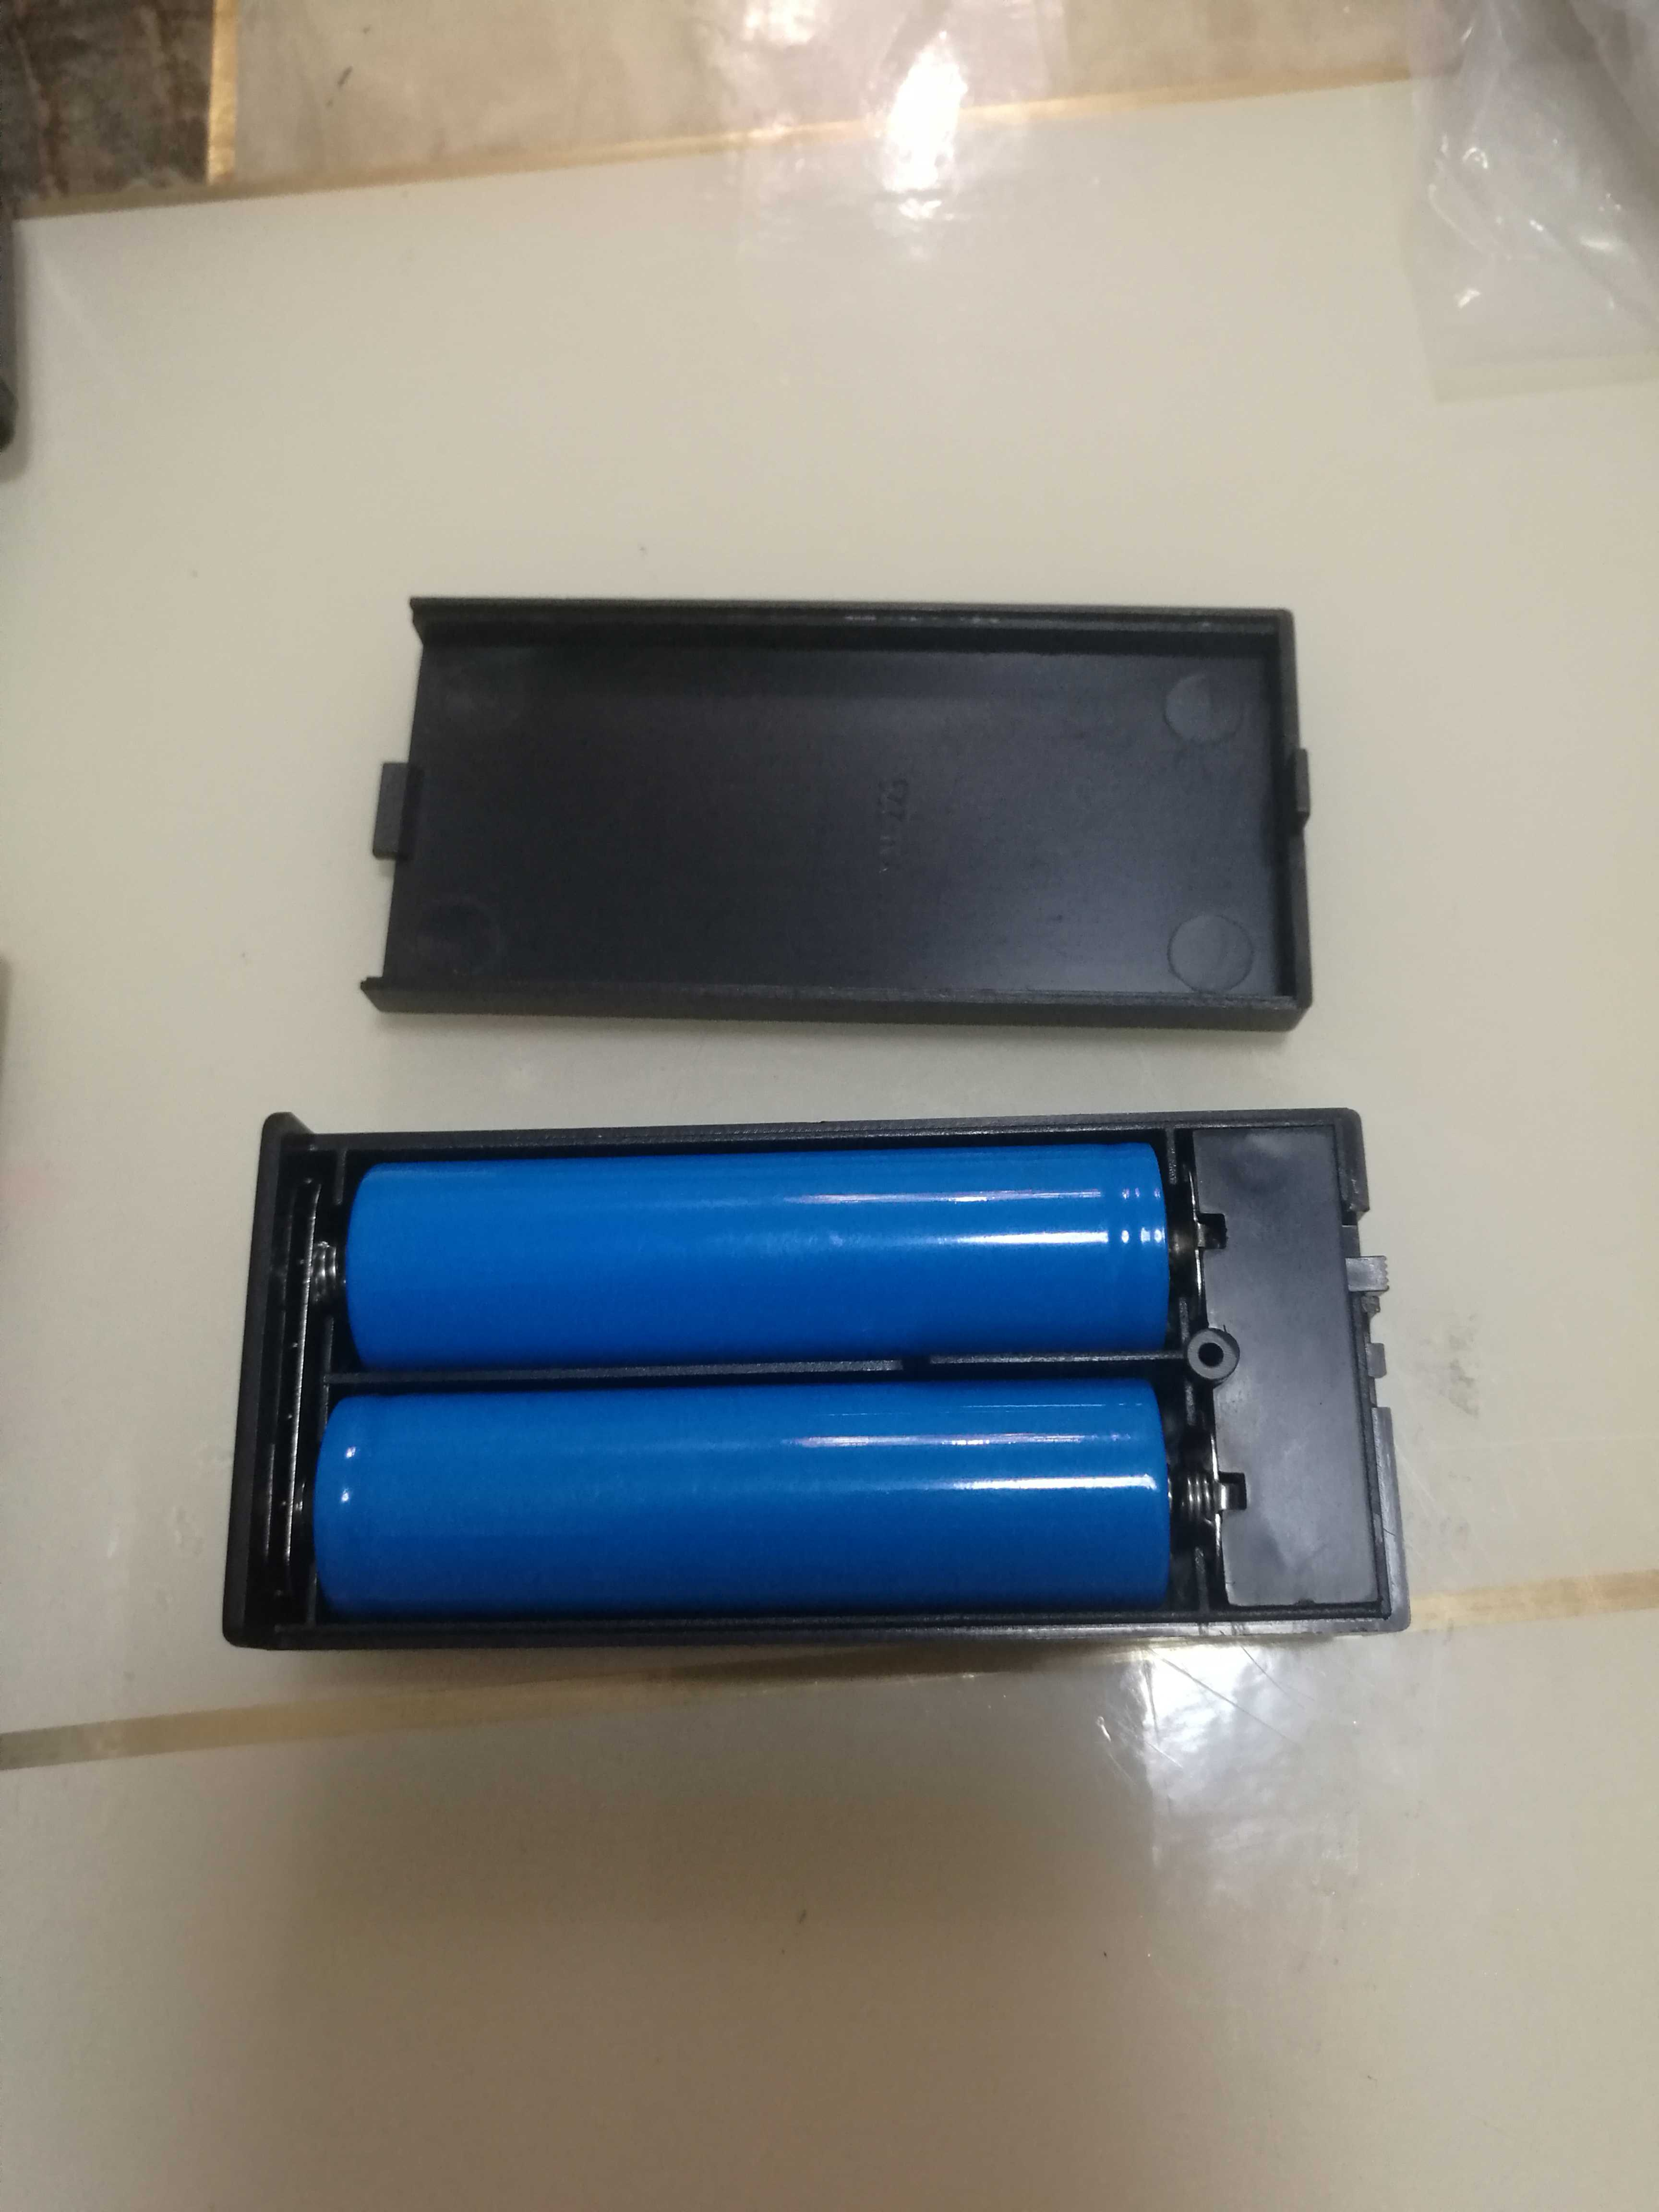 День дракона 80p DAT ящик аккумуляторной батареи , 18650 ящик аккумуляторной батареи